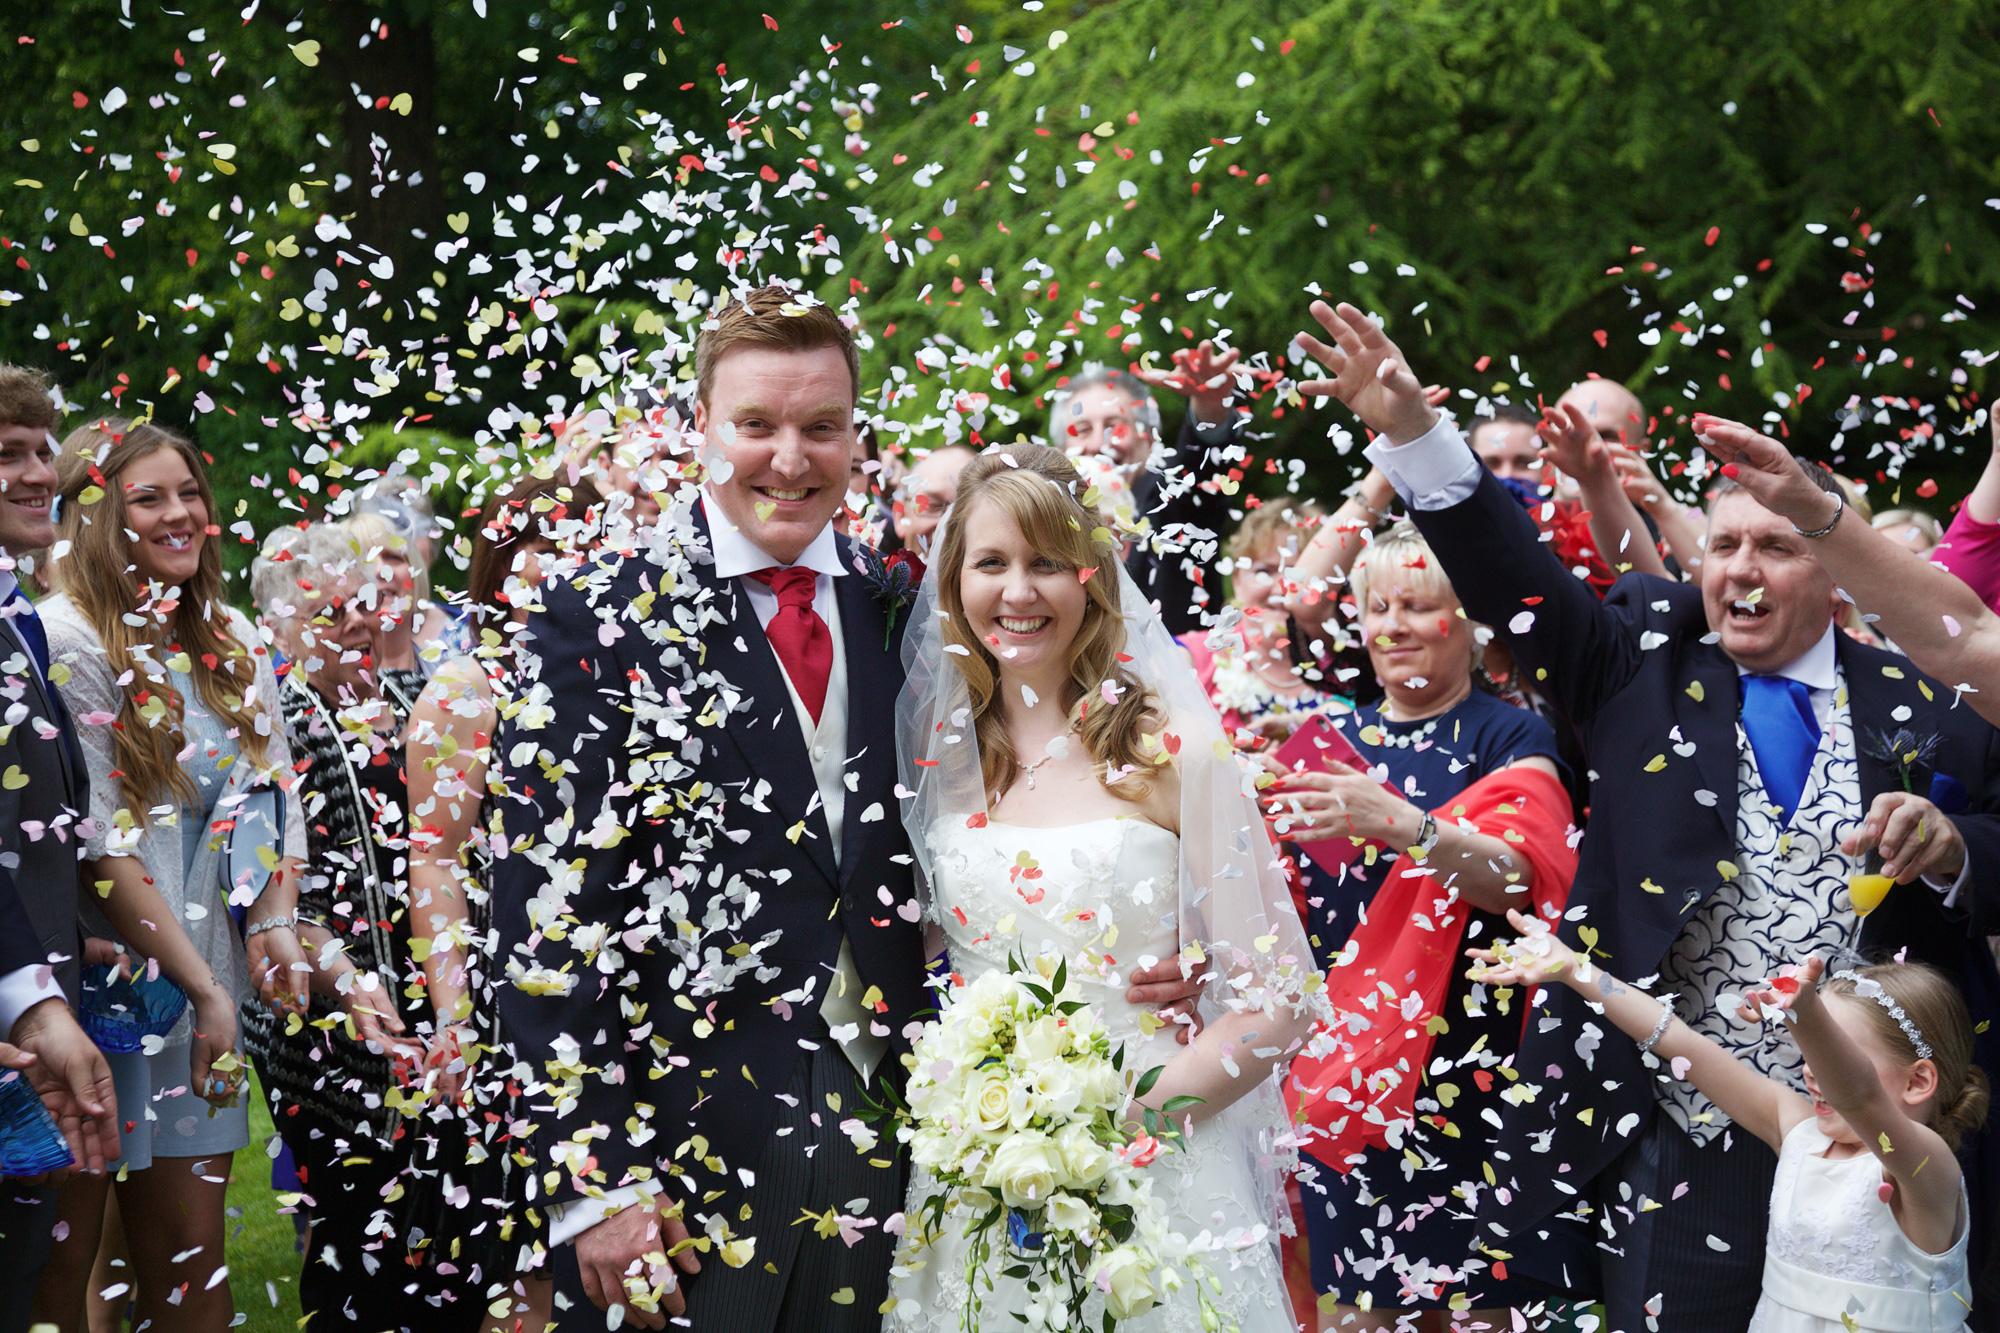 Adam_Hillier_Wedding_Photographer_Newbury_Berkshire_9 (2).jpg